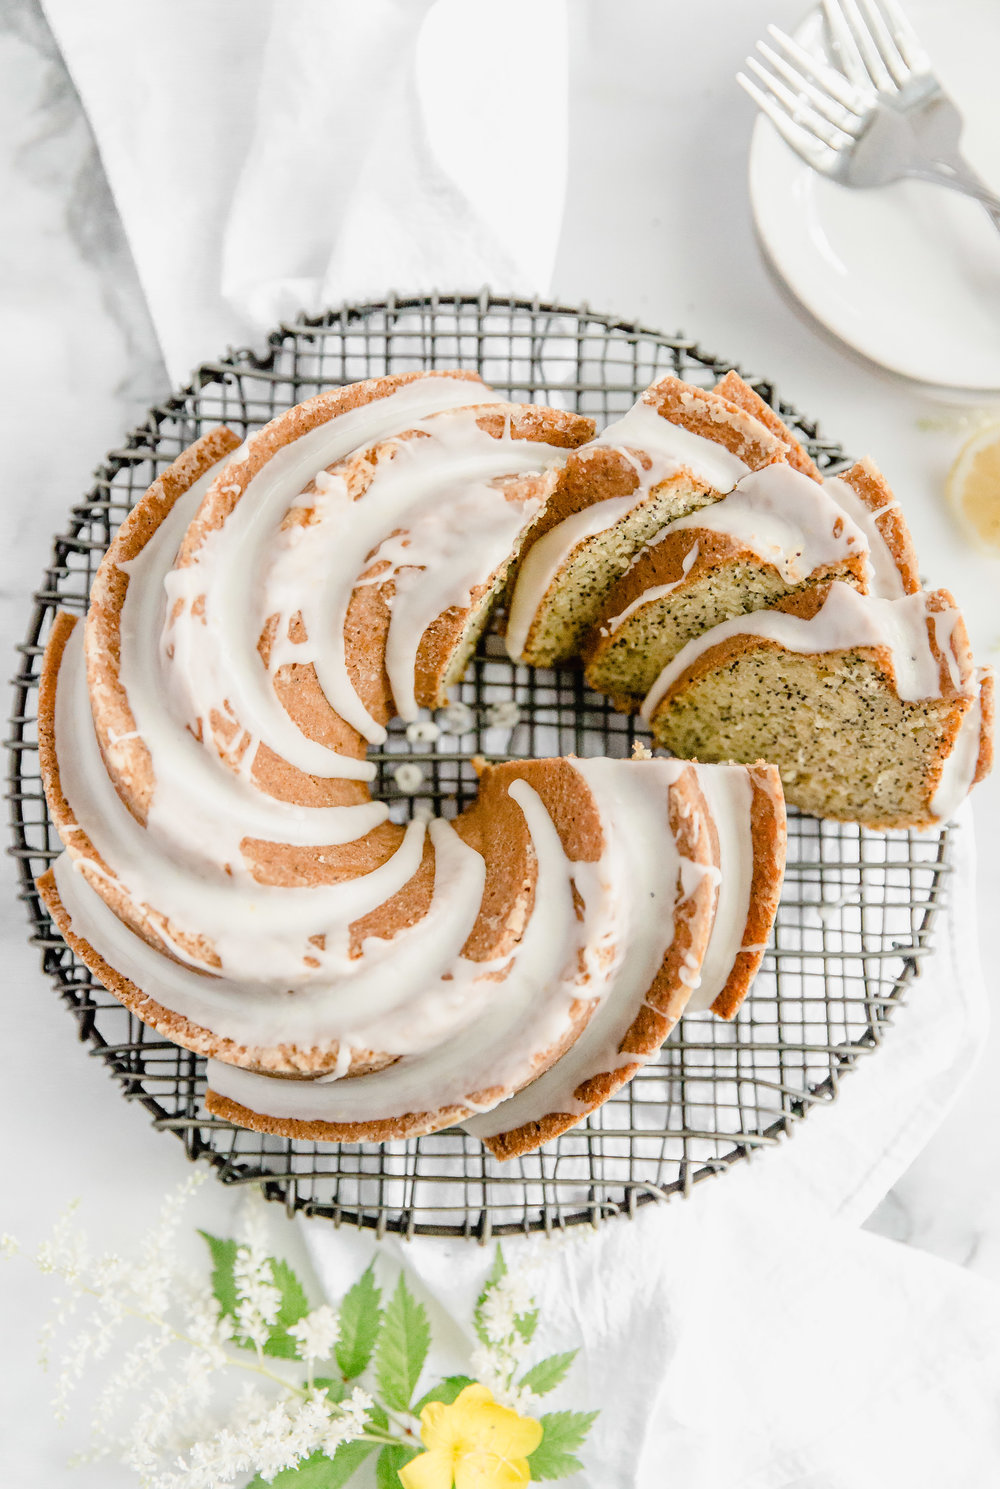 lemon-poppy-seed-bundt-cake-with-lemon-glaze-8.jpg